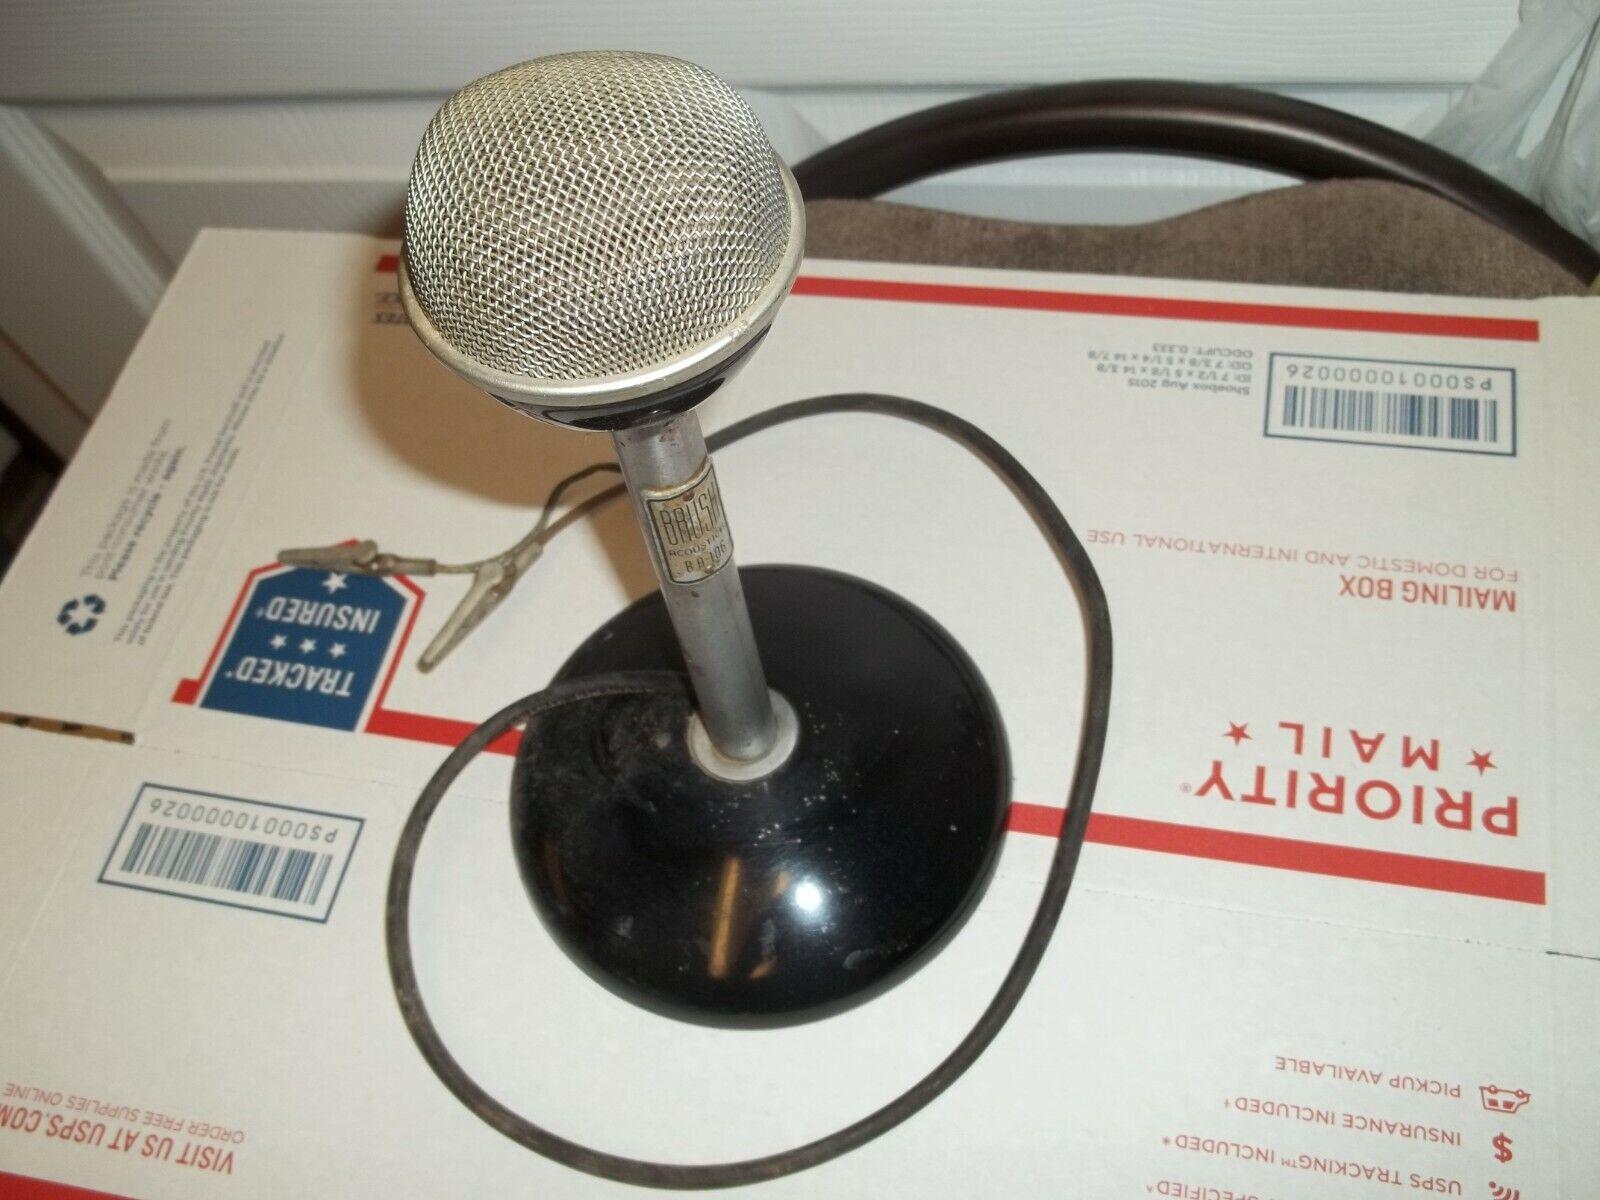 VINTAGE 1940s ASTATIC BRUSH BA-106 CRYSTAL MICROPHONE RARE VINTAGE